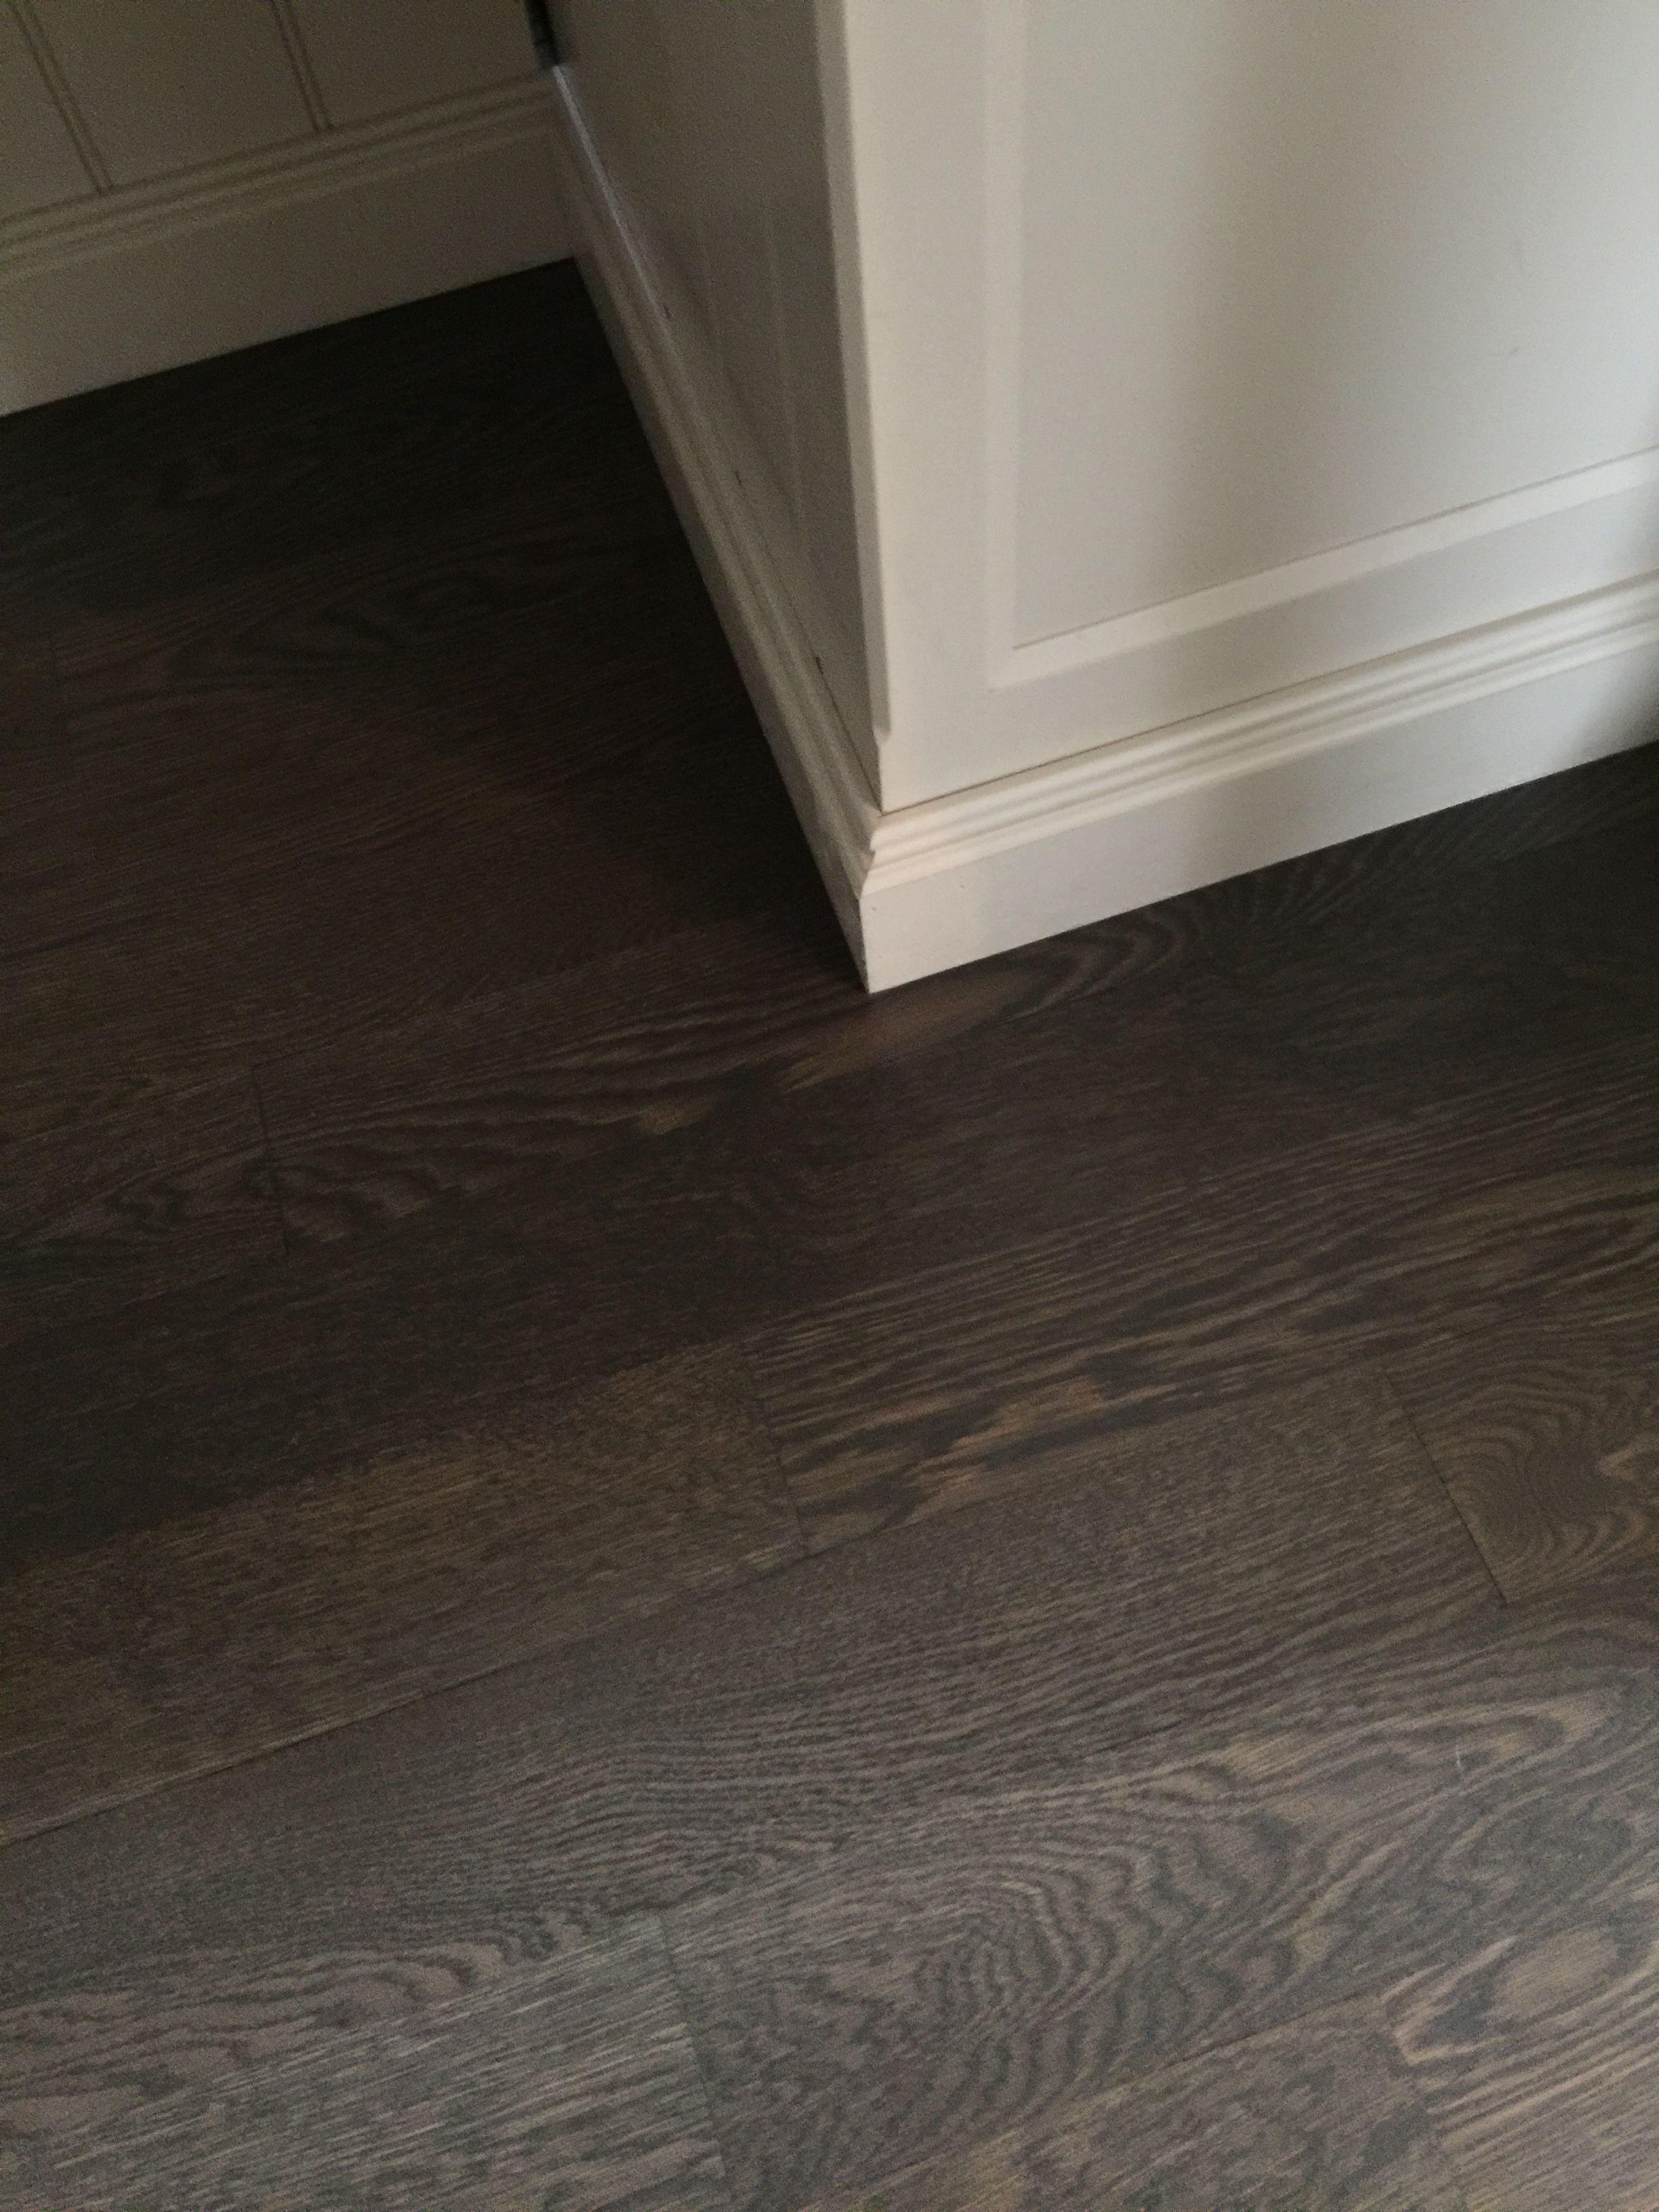 hardwood floor borders inlays of hardwood floor refinishing richmond va 4 white oak hardwood floor in hardwood floor refinishing richmond va 4 white oak hardwood floor stain classic grey and ebony